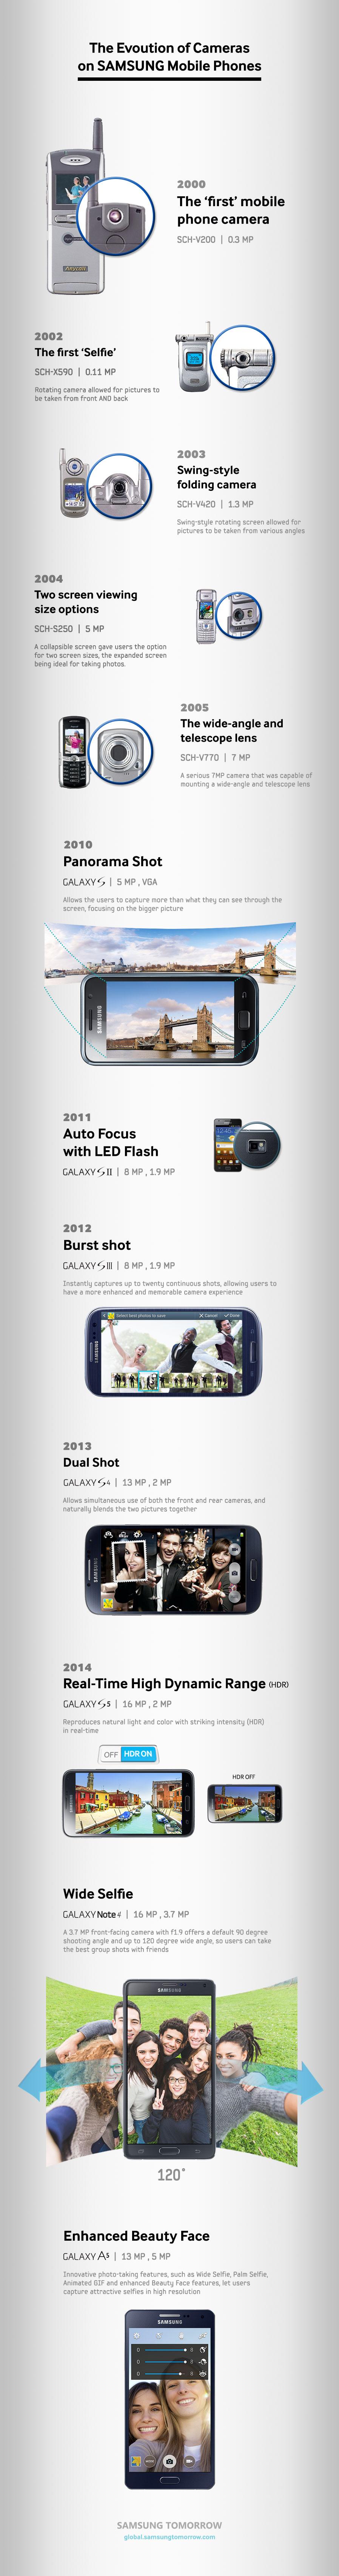 infografica fotocamera smartphone samsung